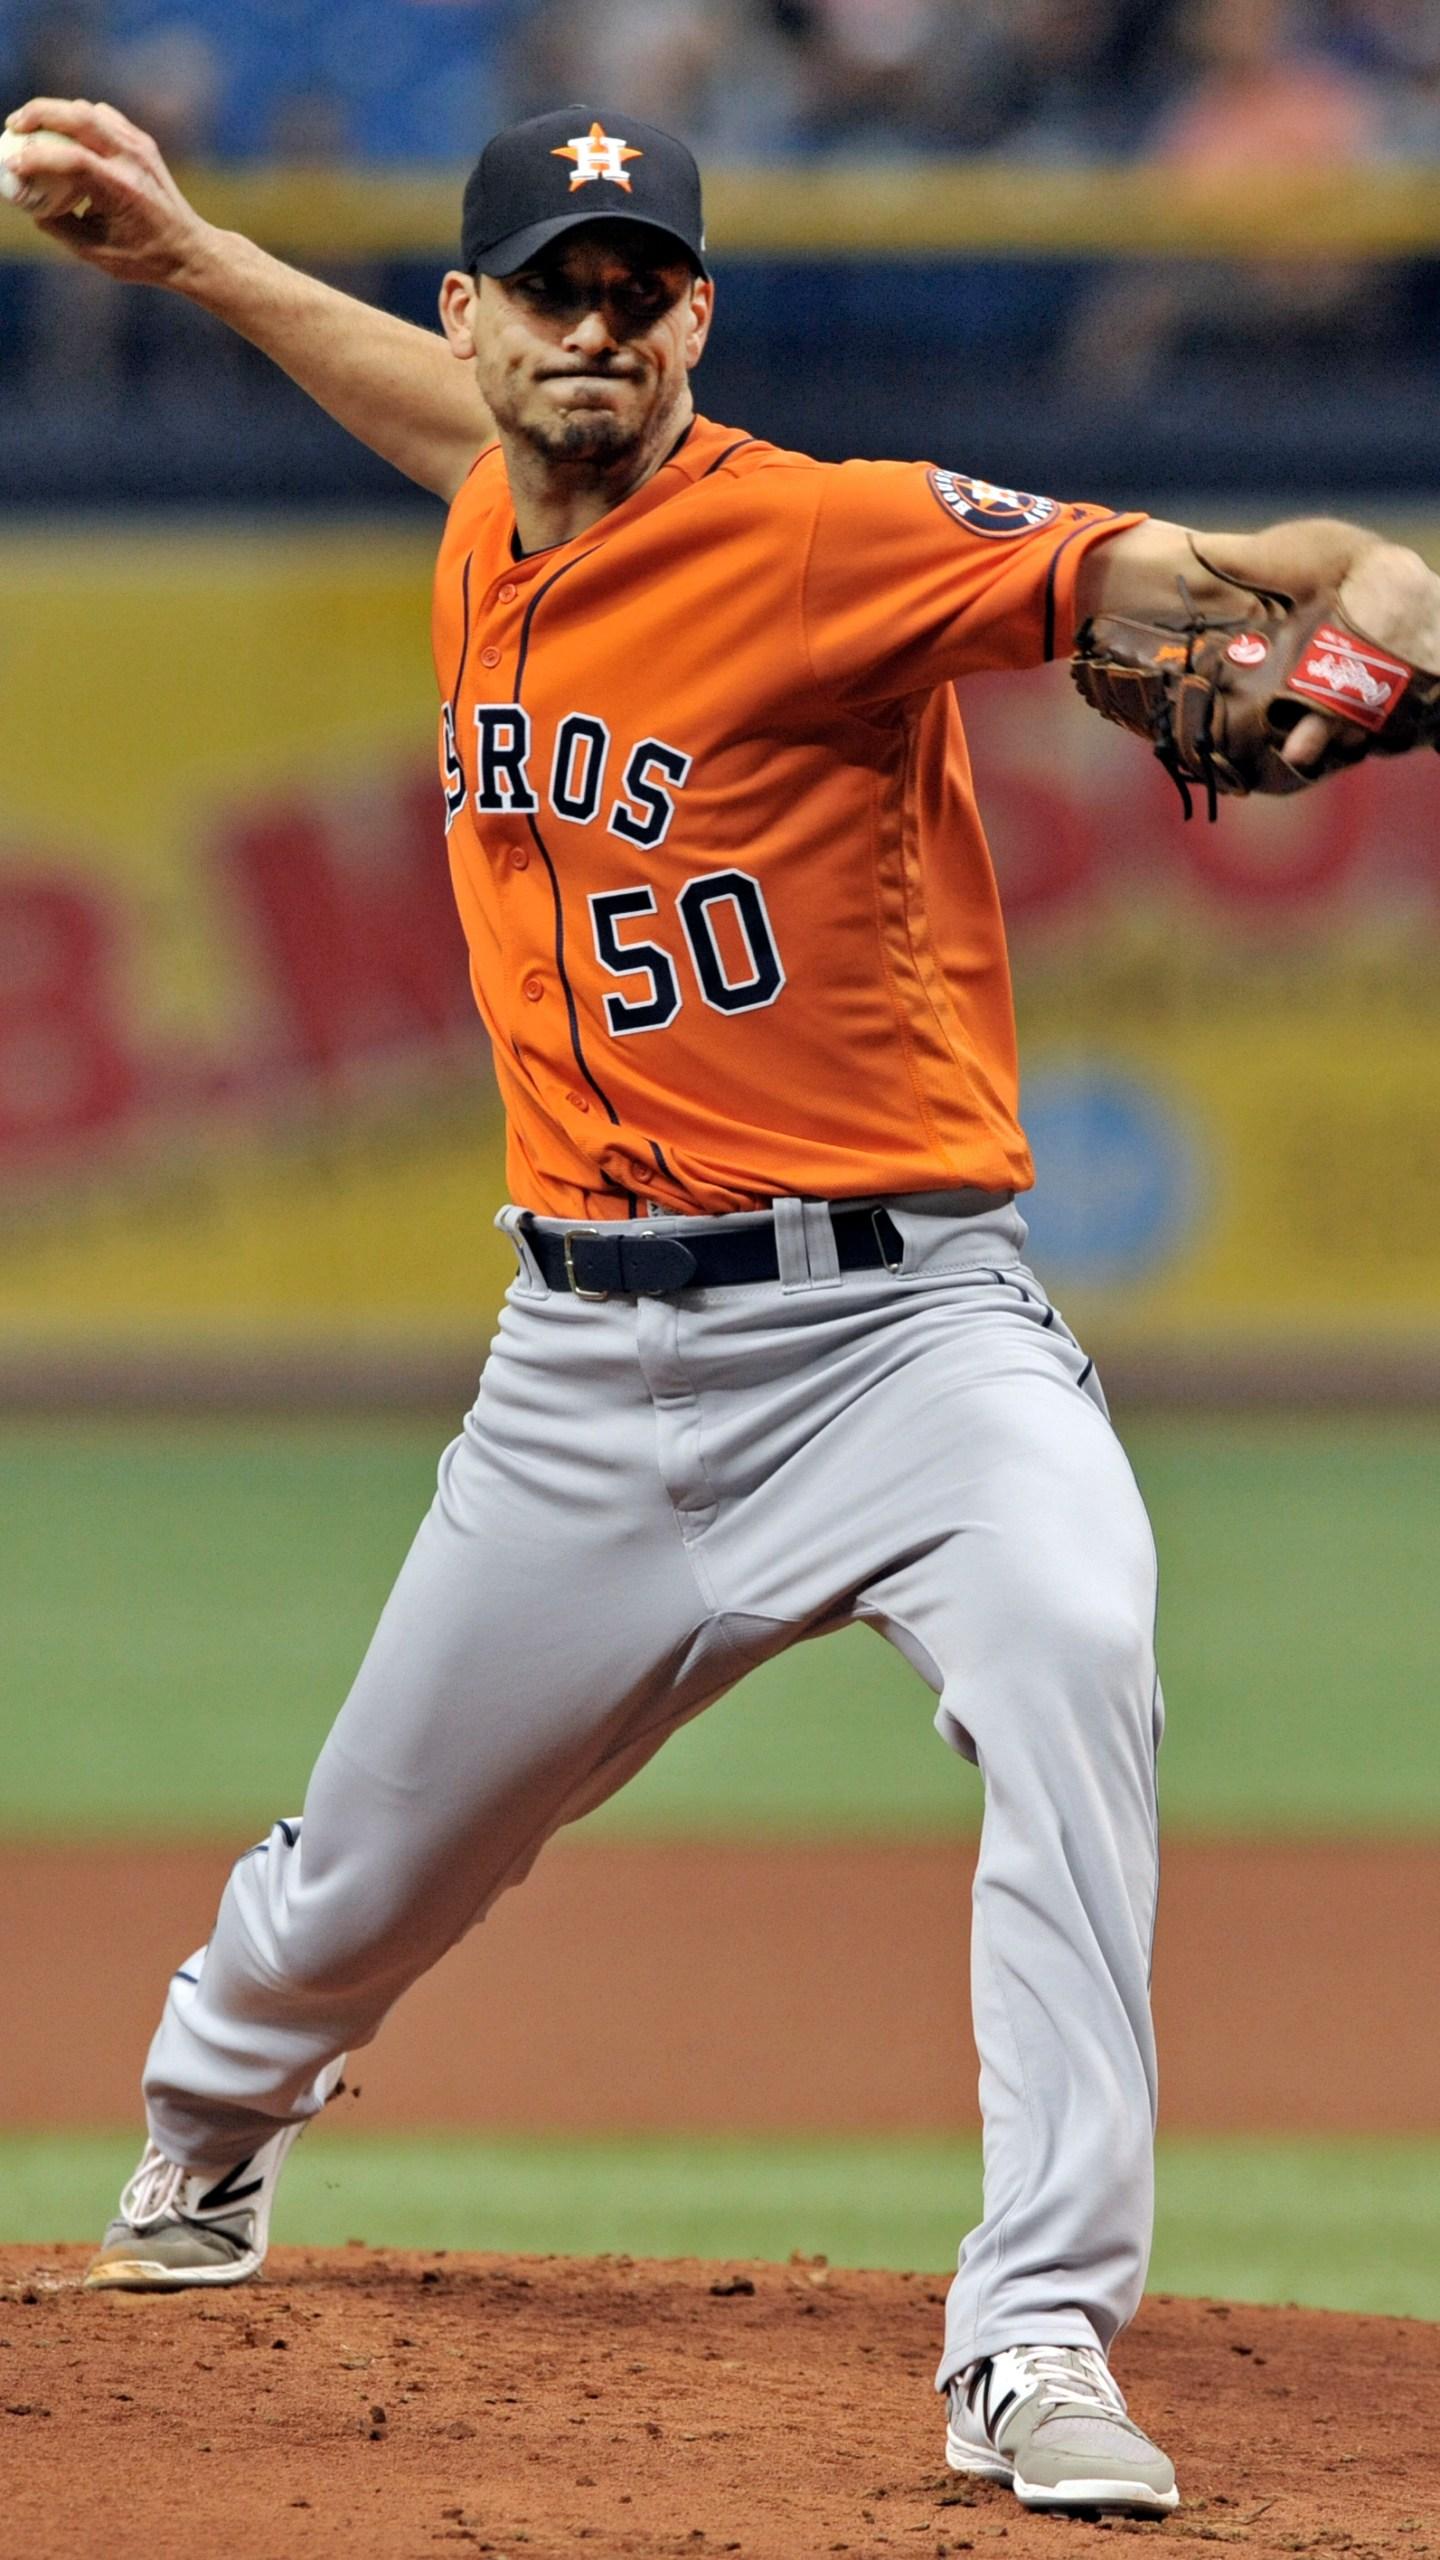 Astros Rays Baseball_1530501756907